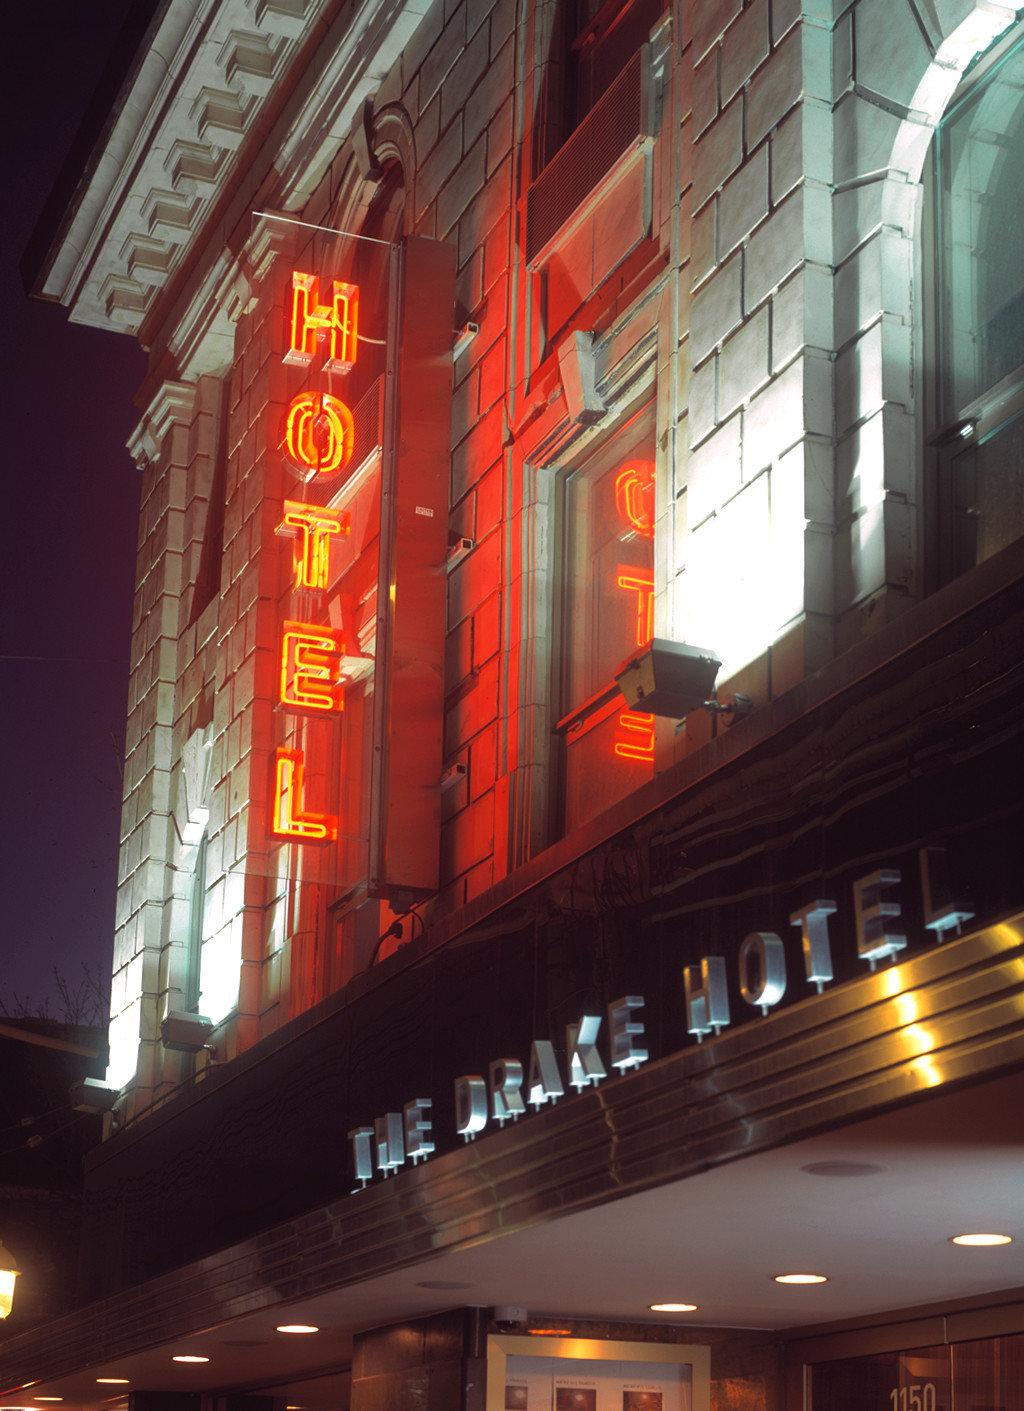 Boutique City Exterior Hip Modern building night light Downtown evening lighting shape restaurant signage